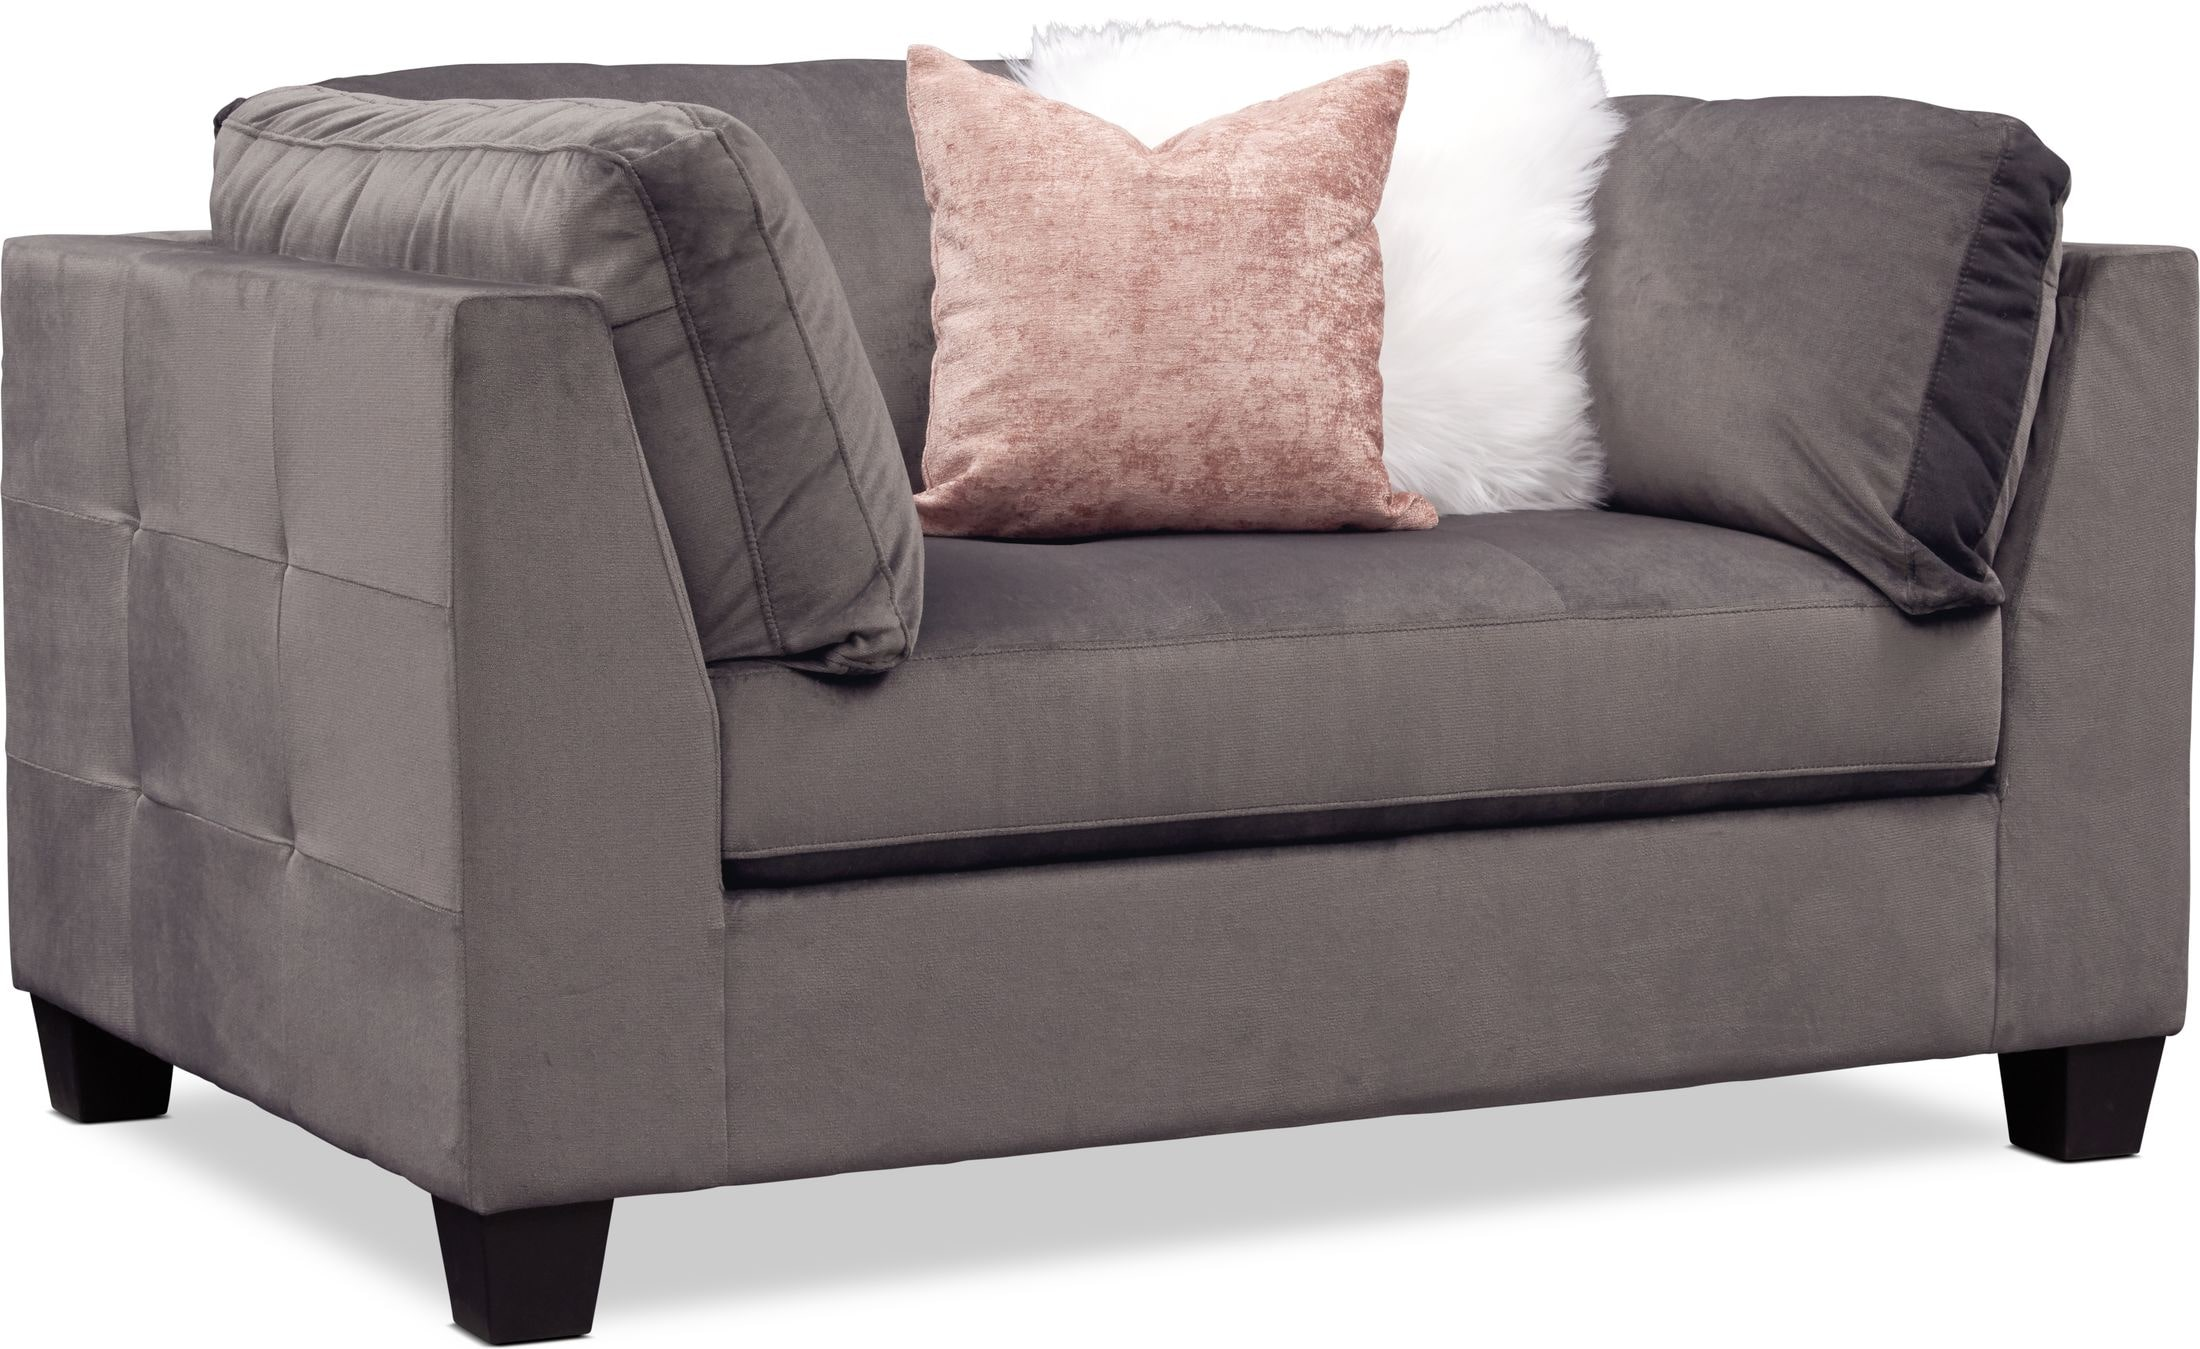 Living Room Furniture - Mackenzie Chair